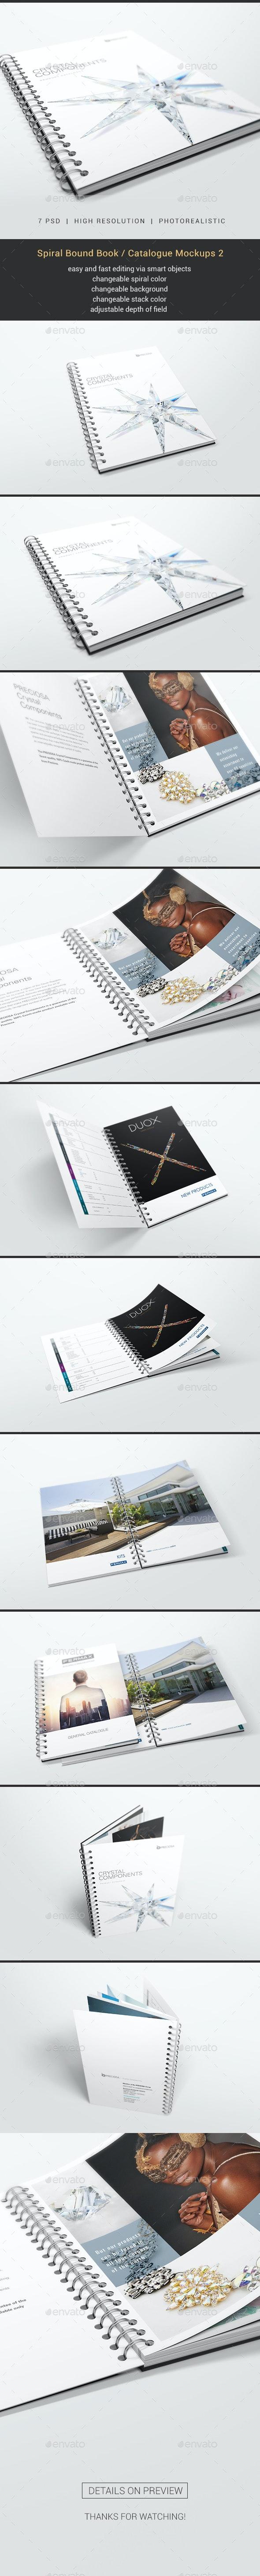 Spiral Bound Book / Catalogue Mockups 2 - Books Print